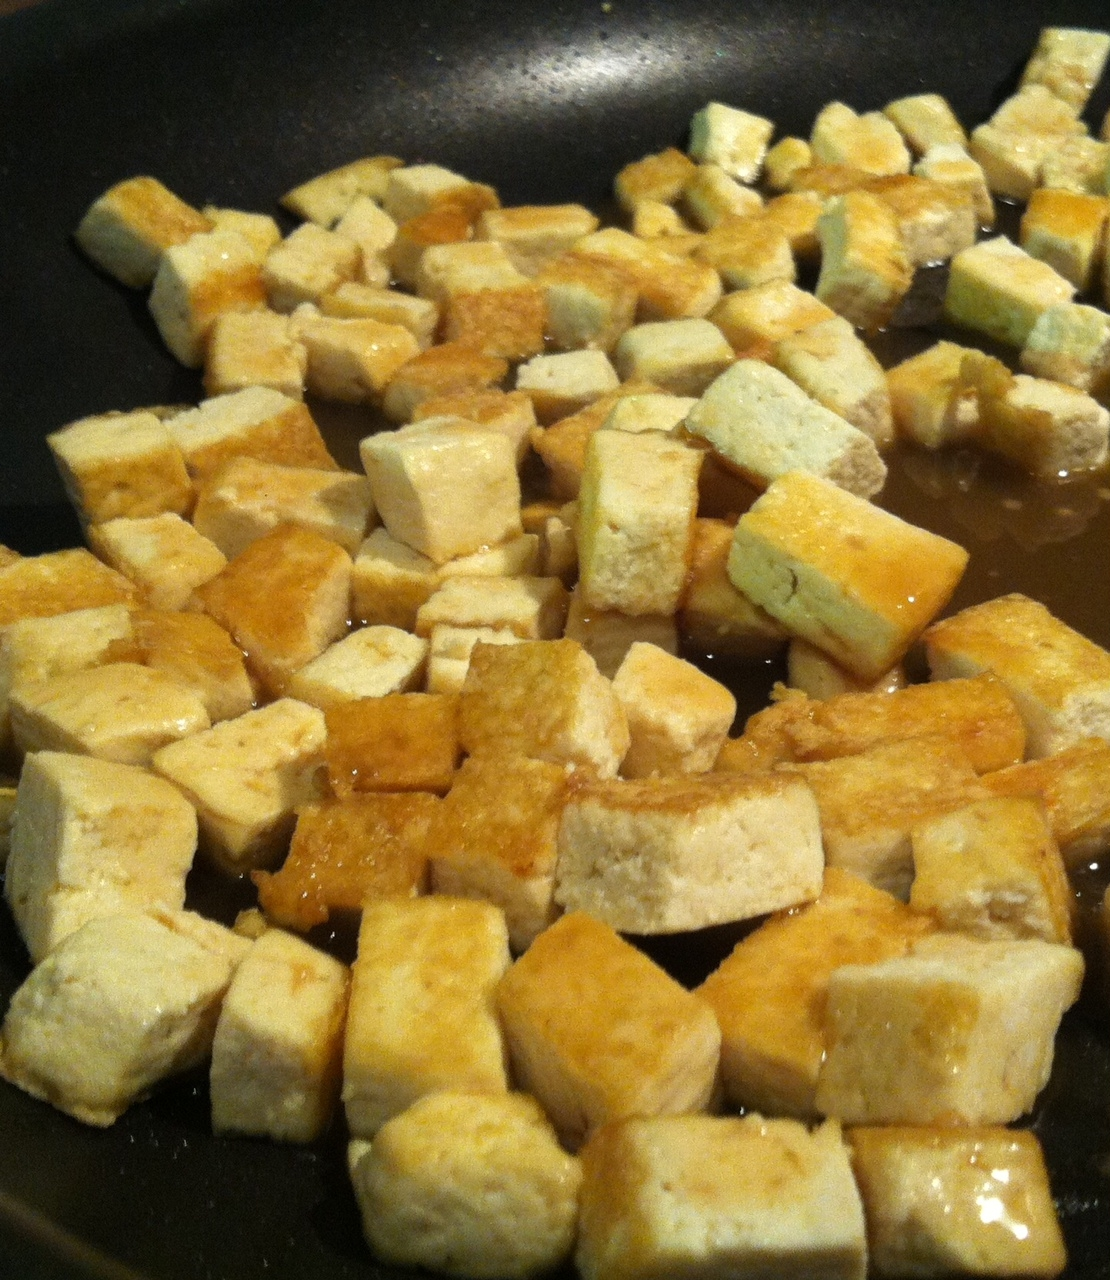 ... Give Peas a Chance: Spaghetti Squash topped with Maple-Glazed Tofu